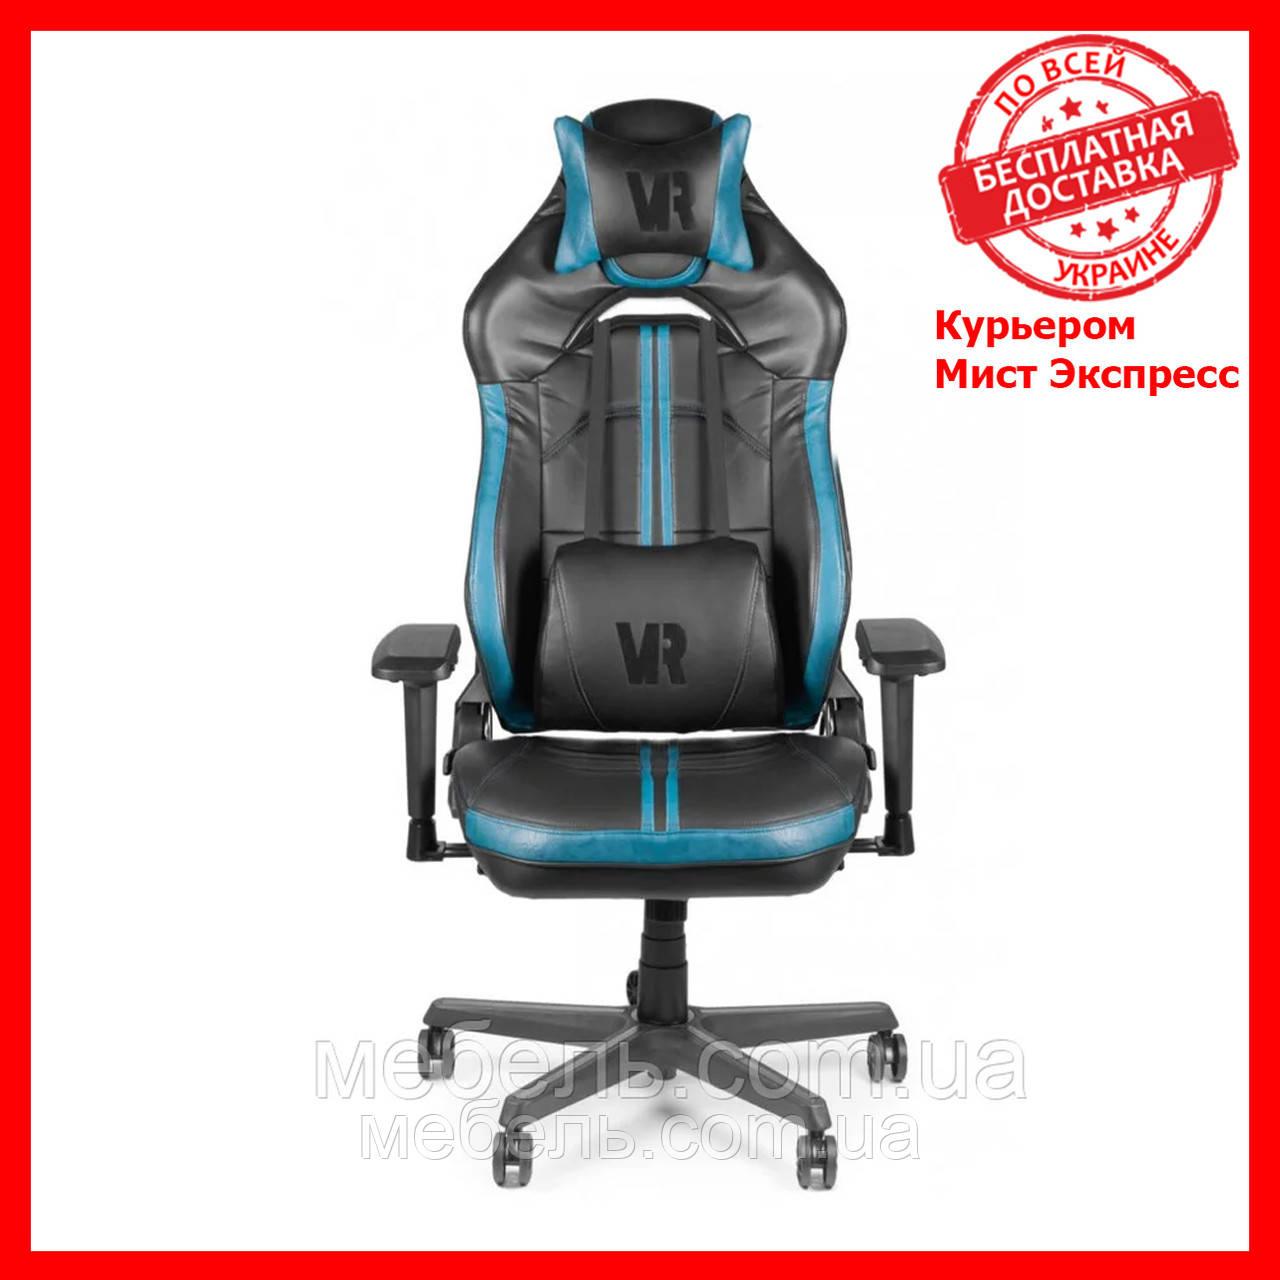 Офисный стул Barsky VR Cyberpunk Blue CYB-02